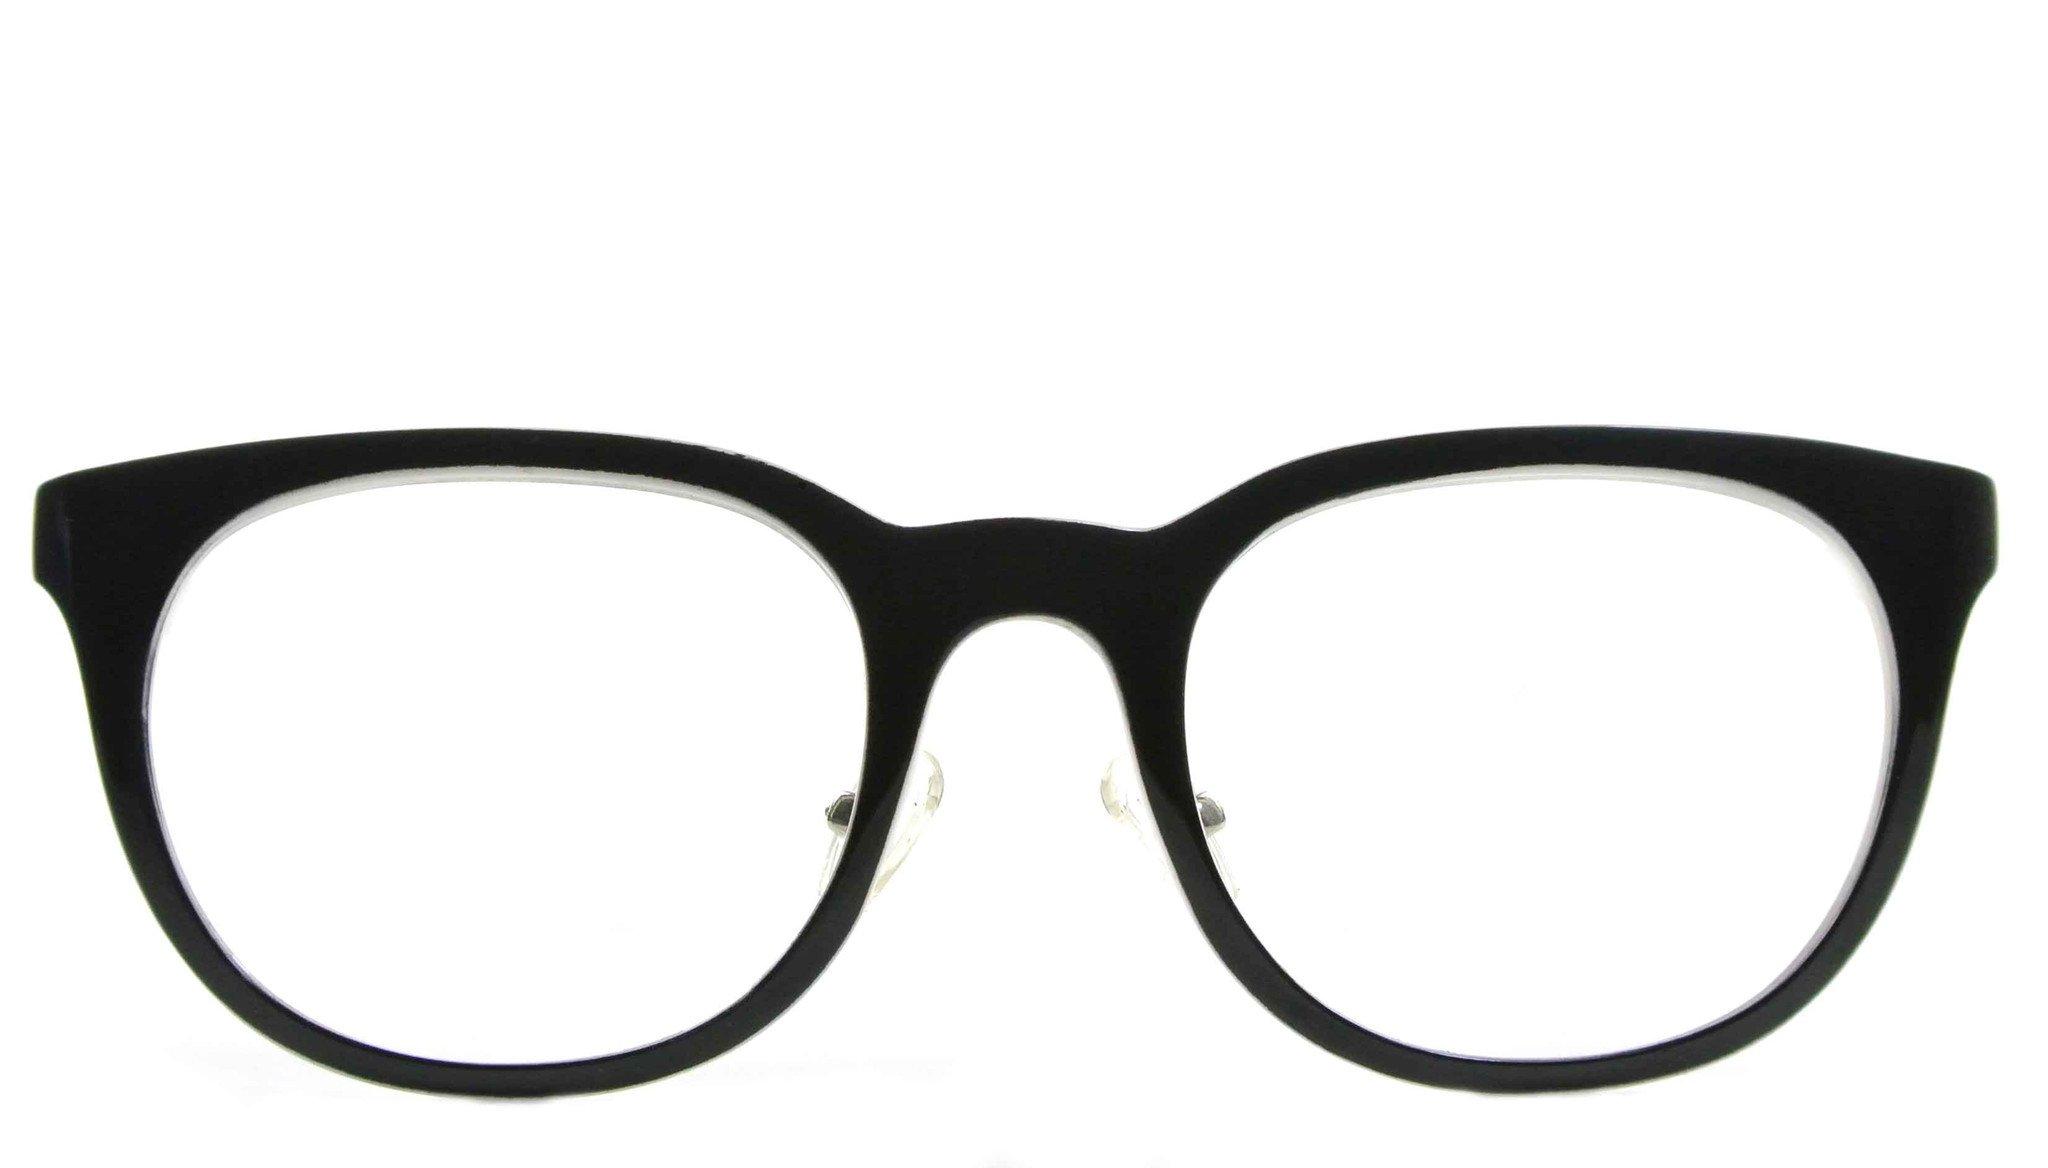 2048x1168 Glasses Clipart Transparent Background